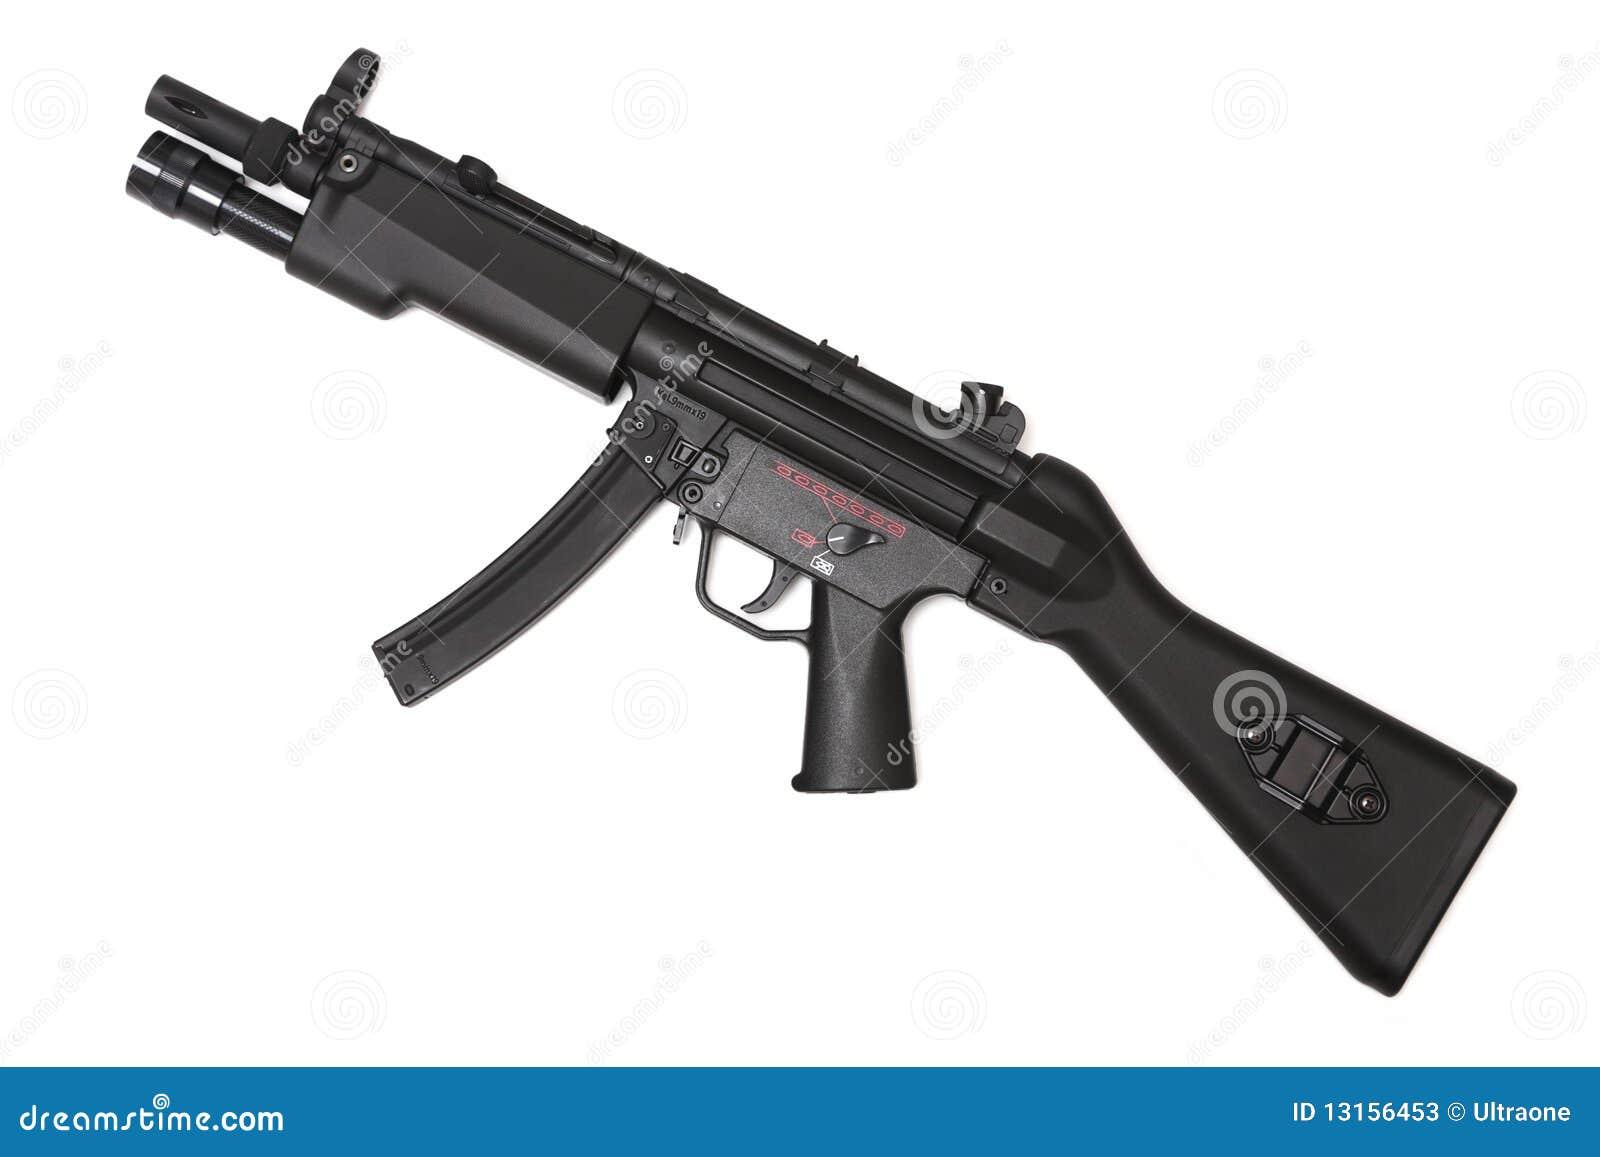 Serie del arma. Subfusil ametrallador moderno, vista lateral.